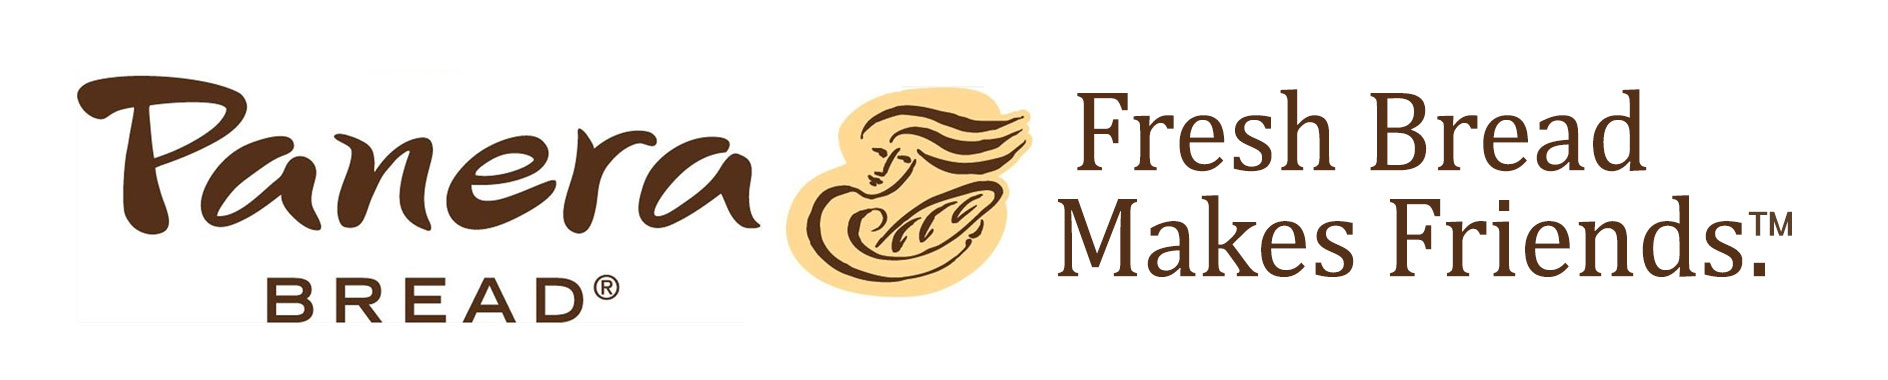 image of Panera Bread logo and motto